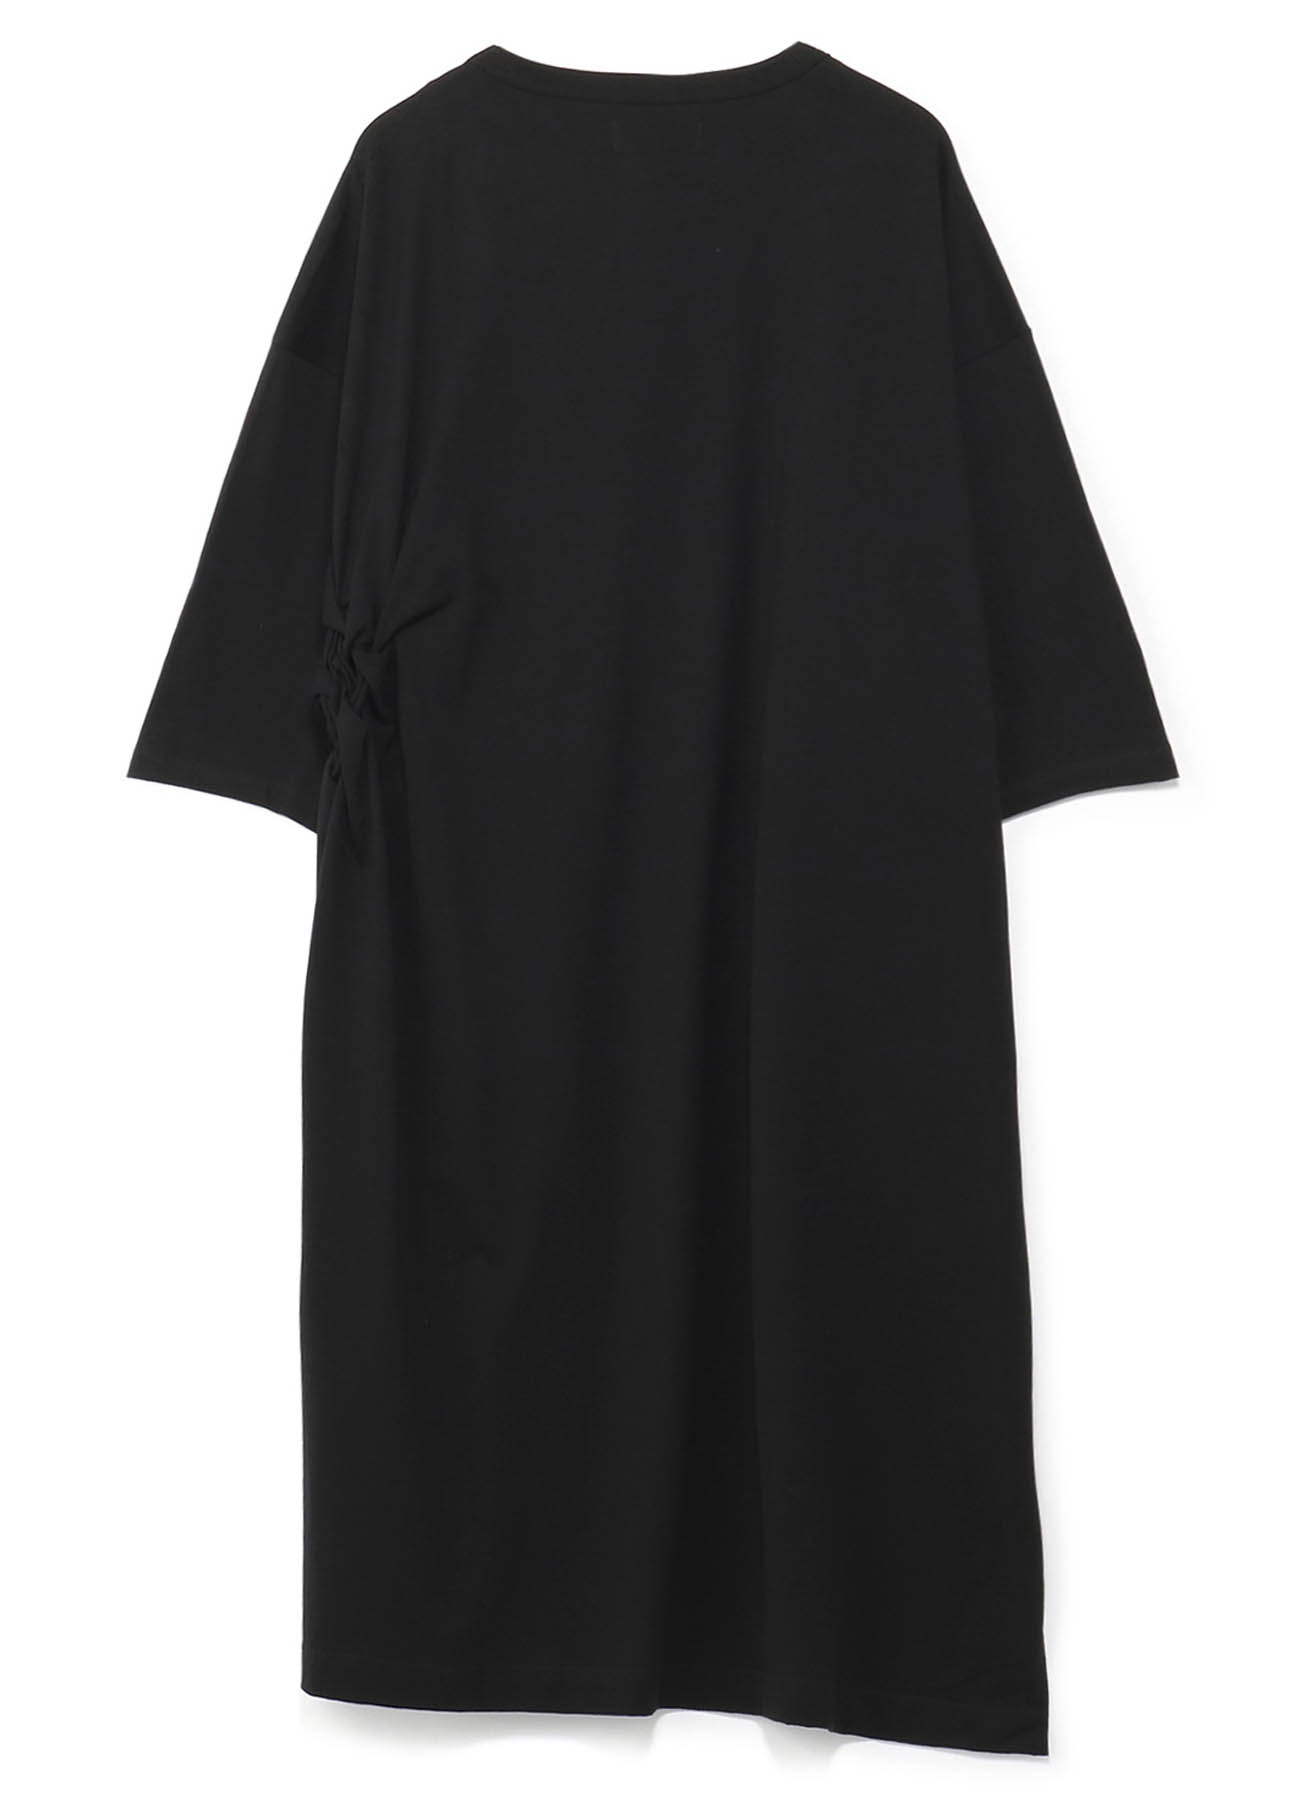 40/2 Cotton Jersey Lattice Smocking Pocket T-shirt